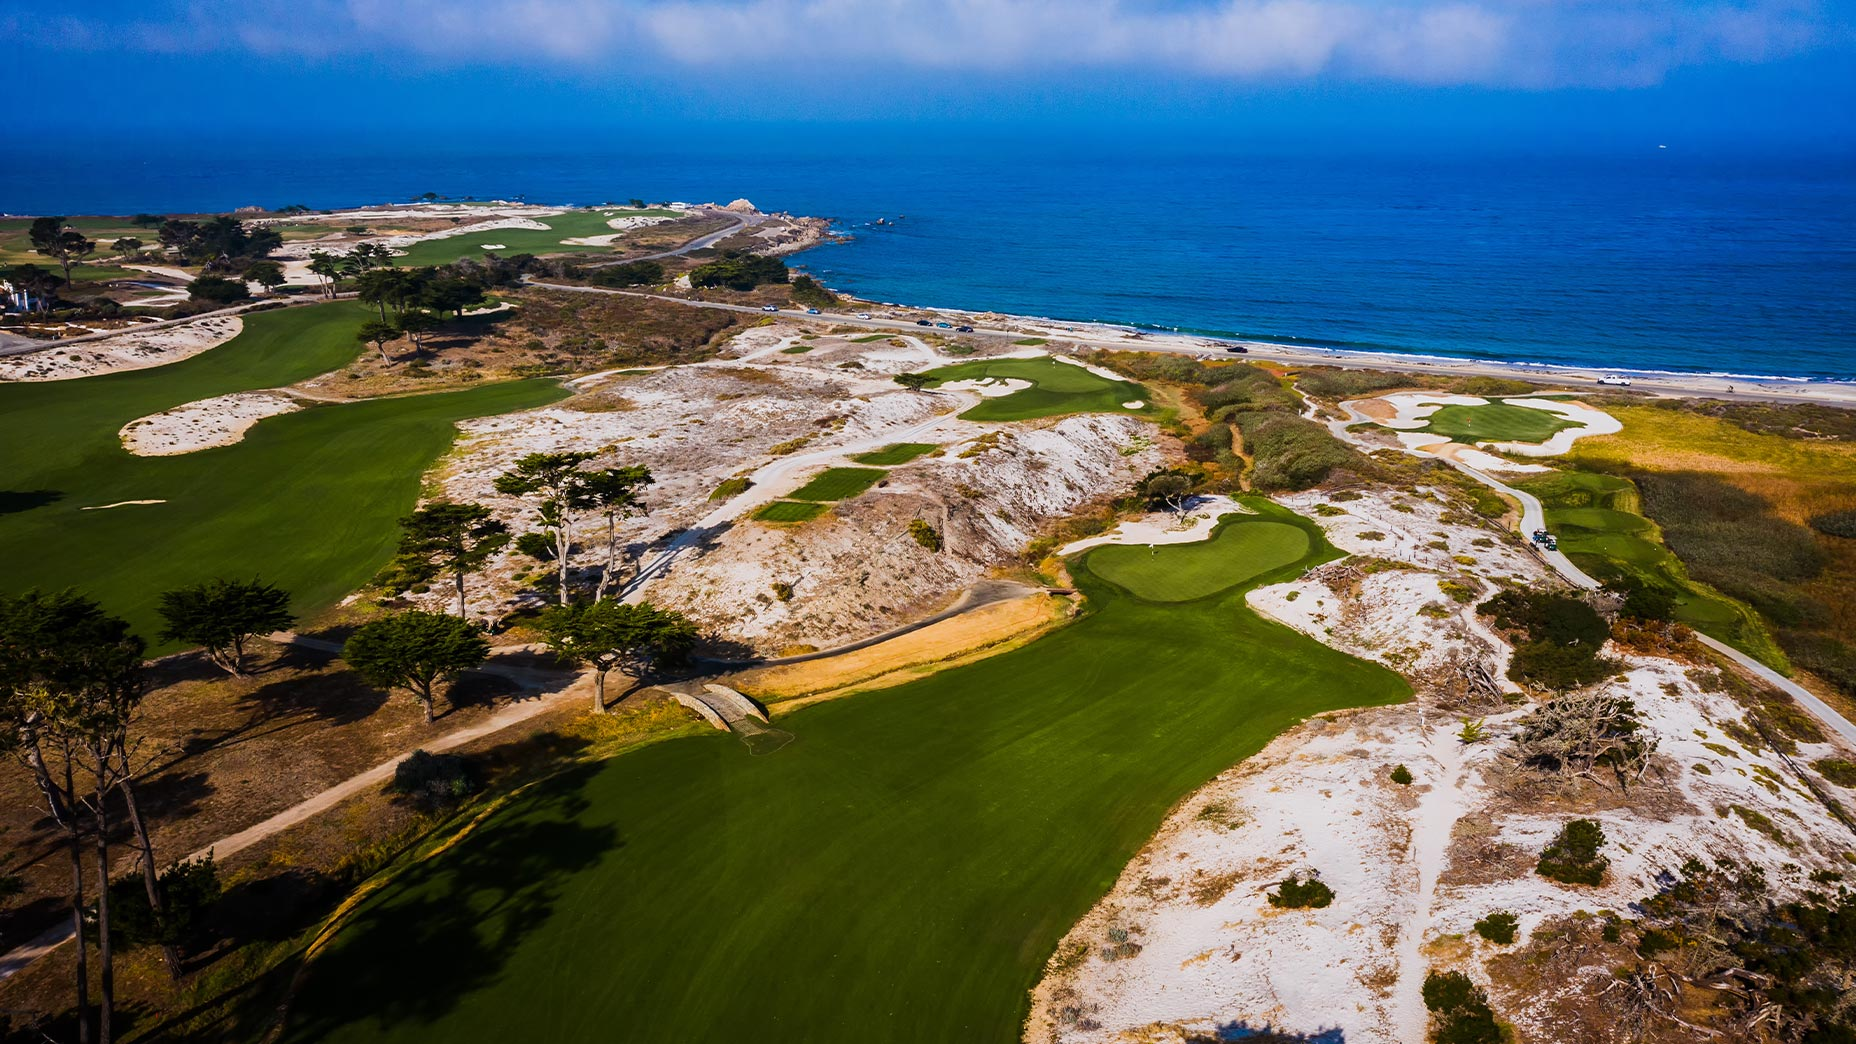 monterey peninsula dunes course